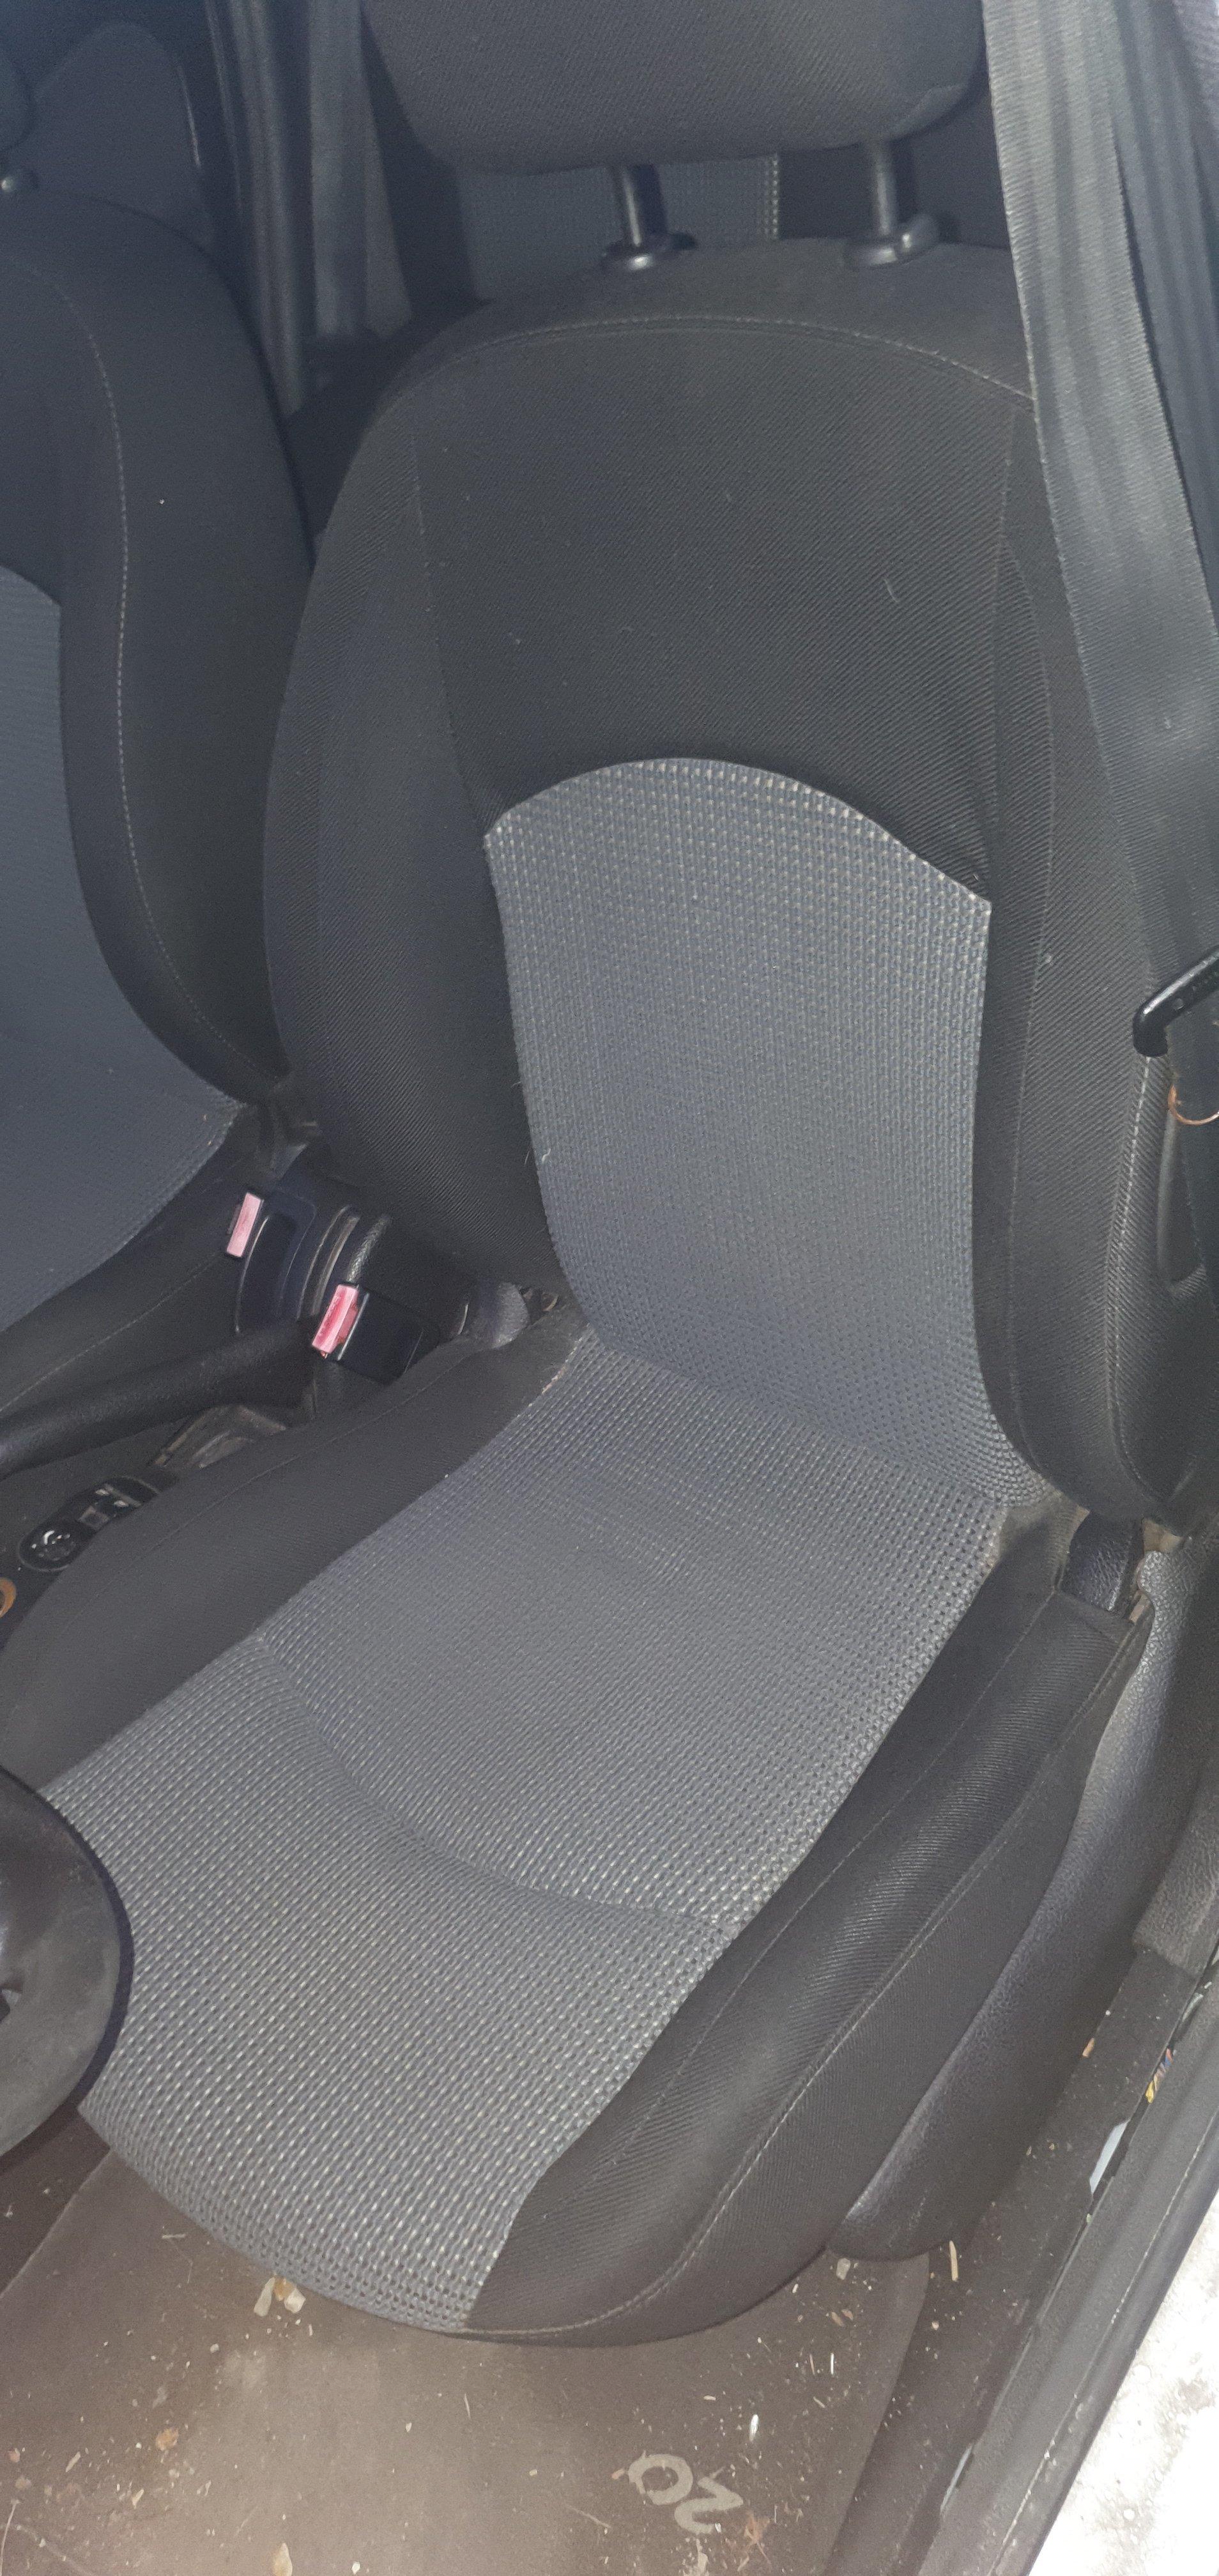 mousse siège conducteur 1583960496-58f671ed-63c3-11ea-8be3-9fe1dee90304